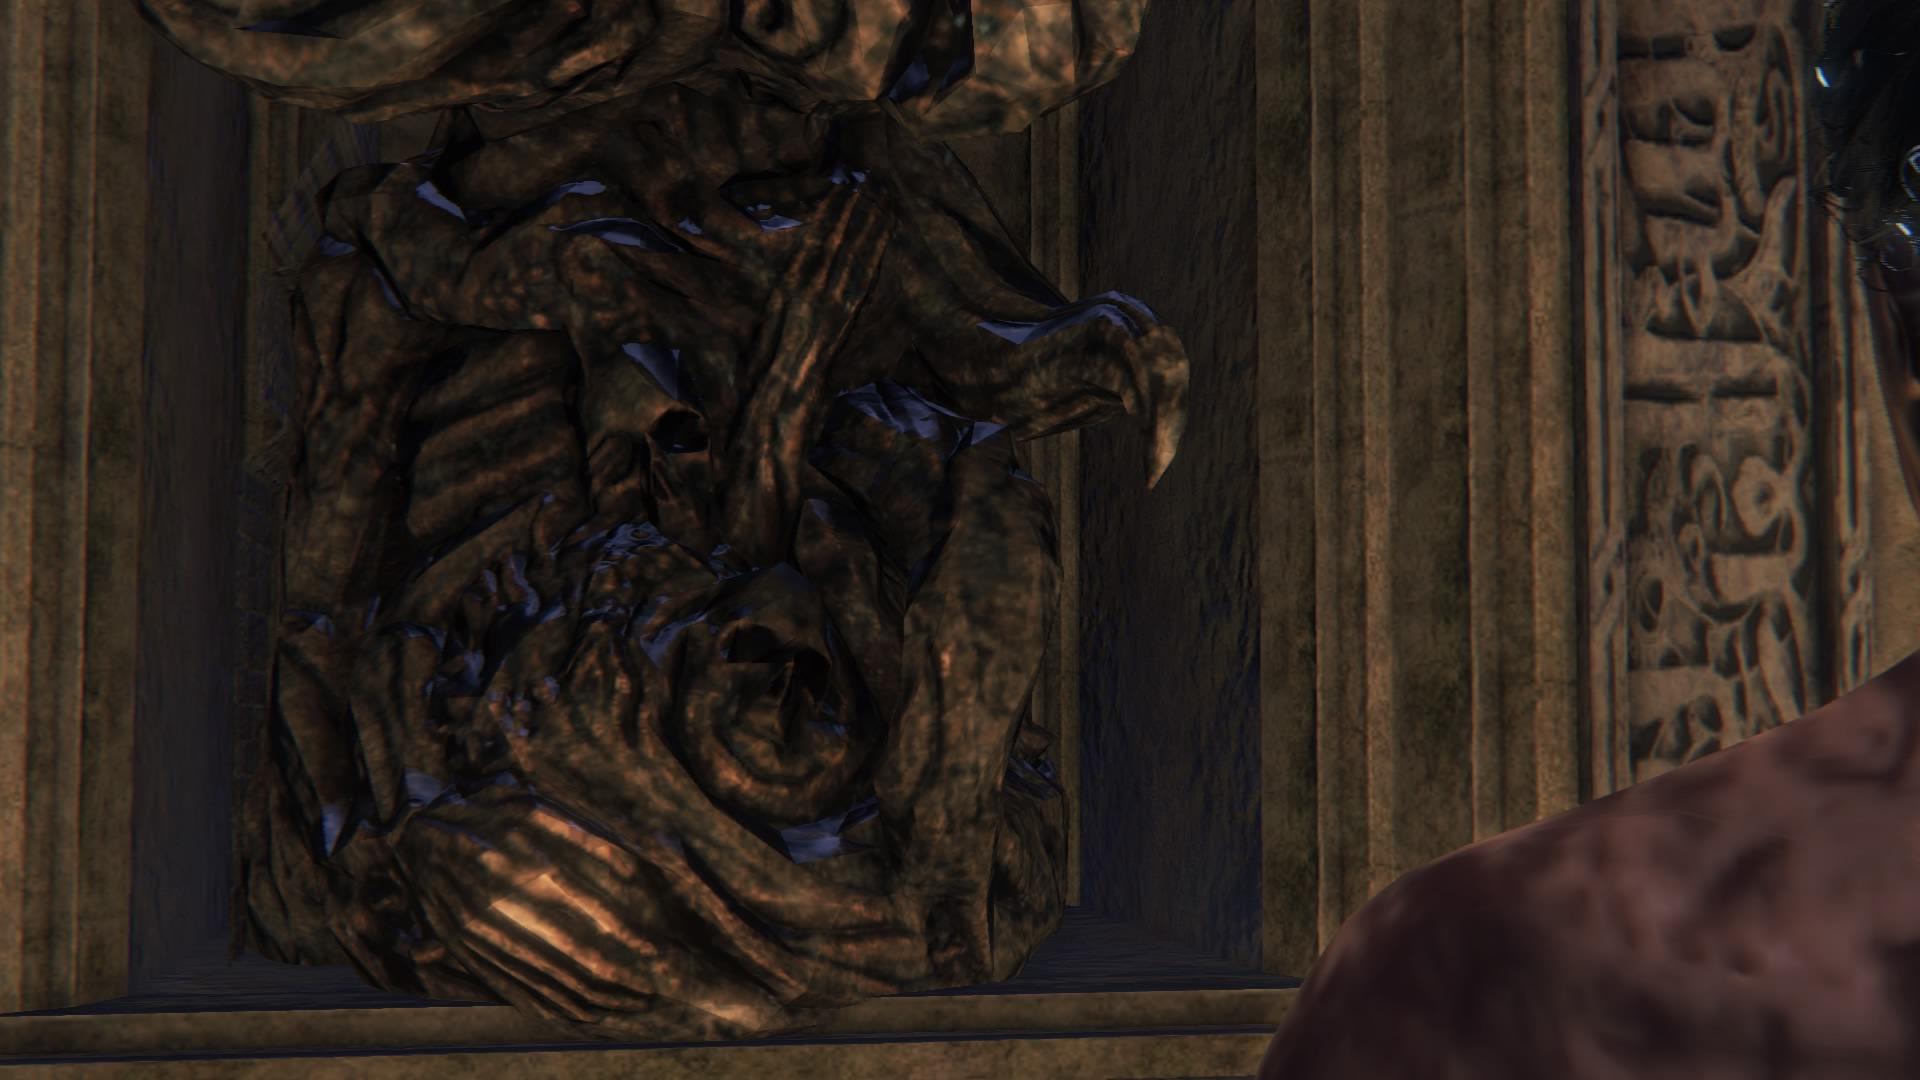 Bloodborne: Moon Presence Boss Fight (1080p) - YouTube